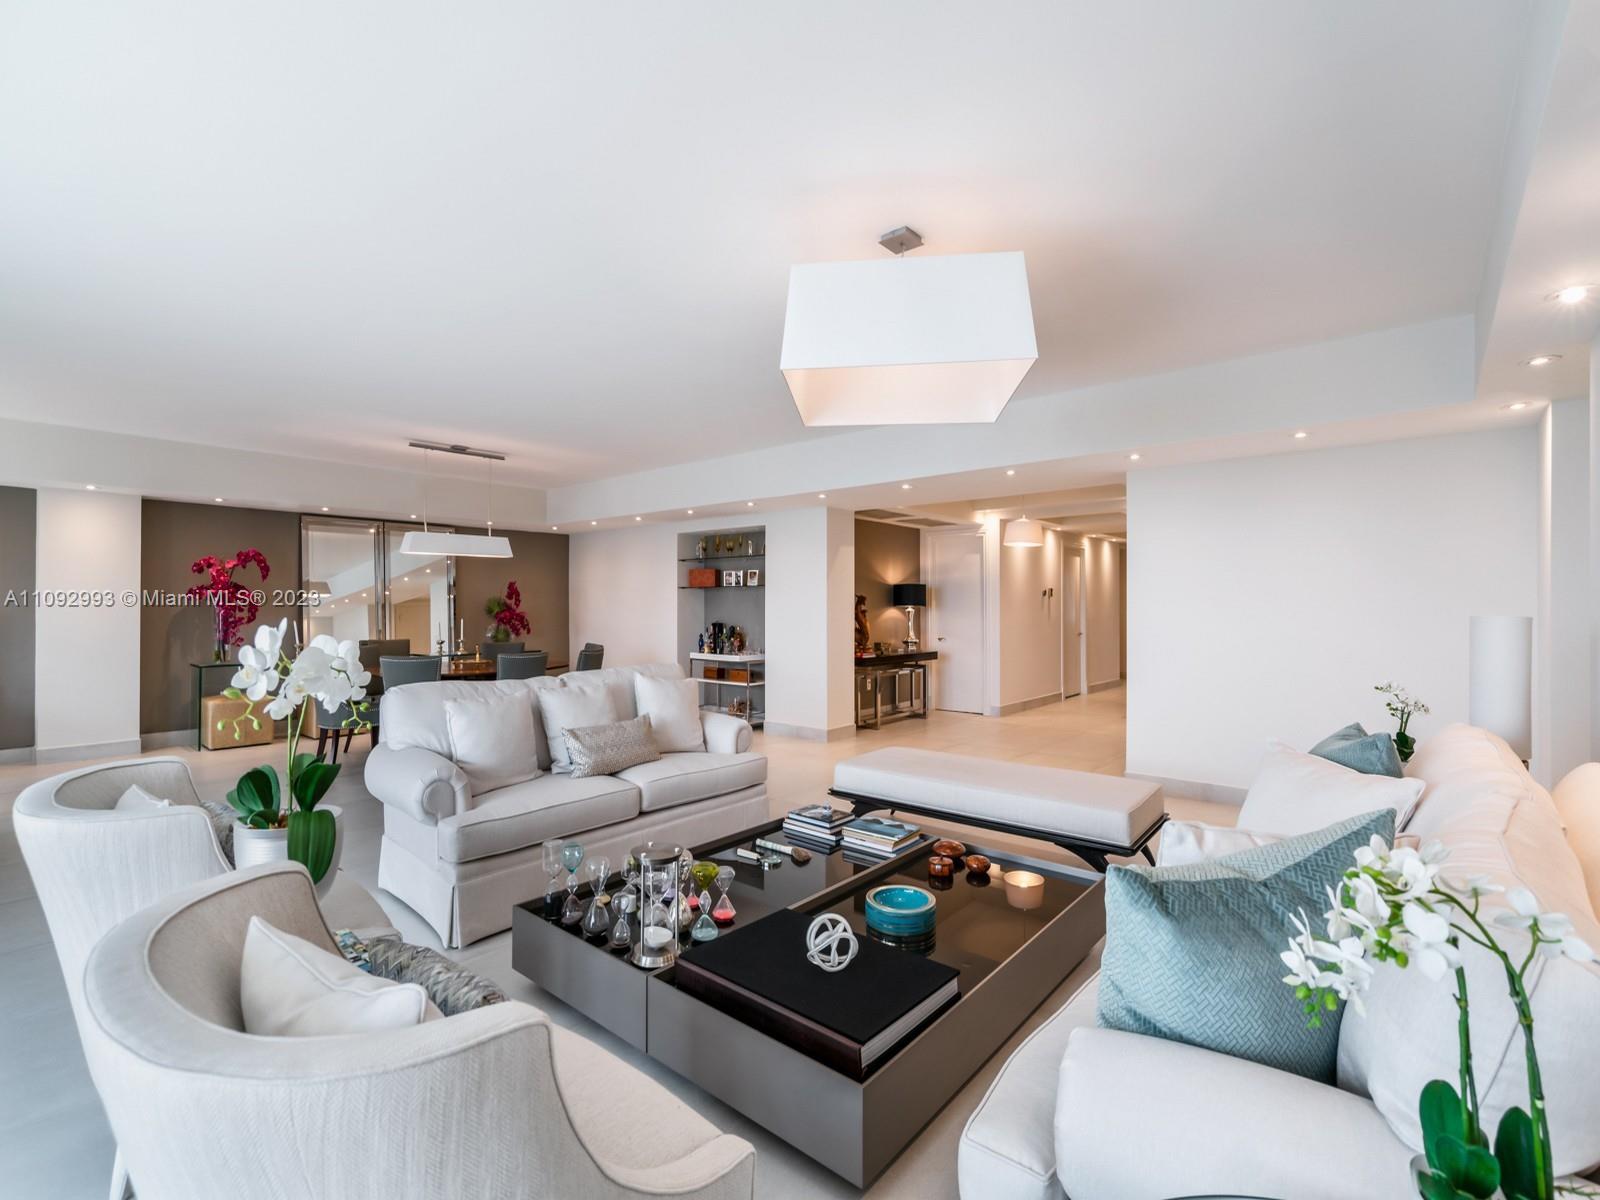 Grand Bay Residences #PH-2C - 445 Grand Bay Dr #PH-2C, Key Biscayne, FL 33149